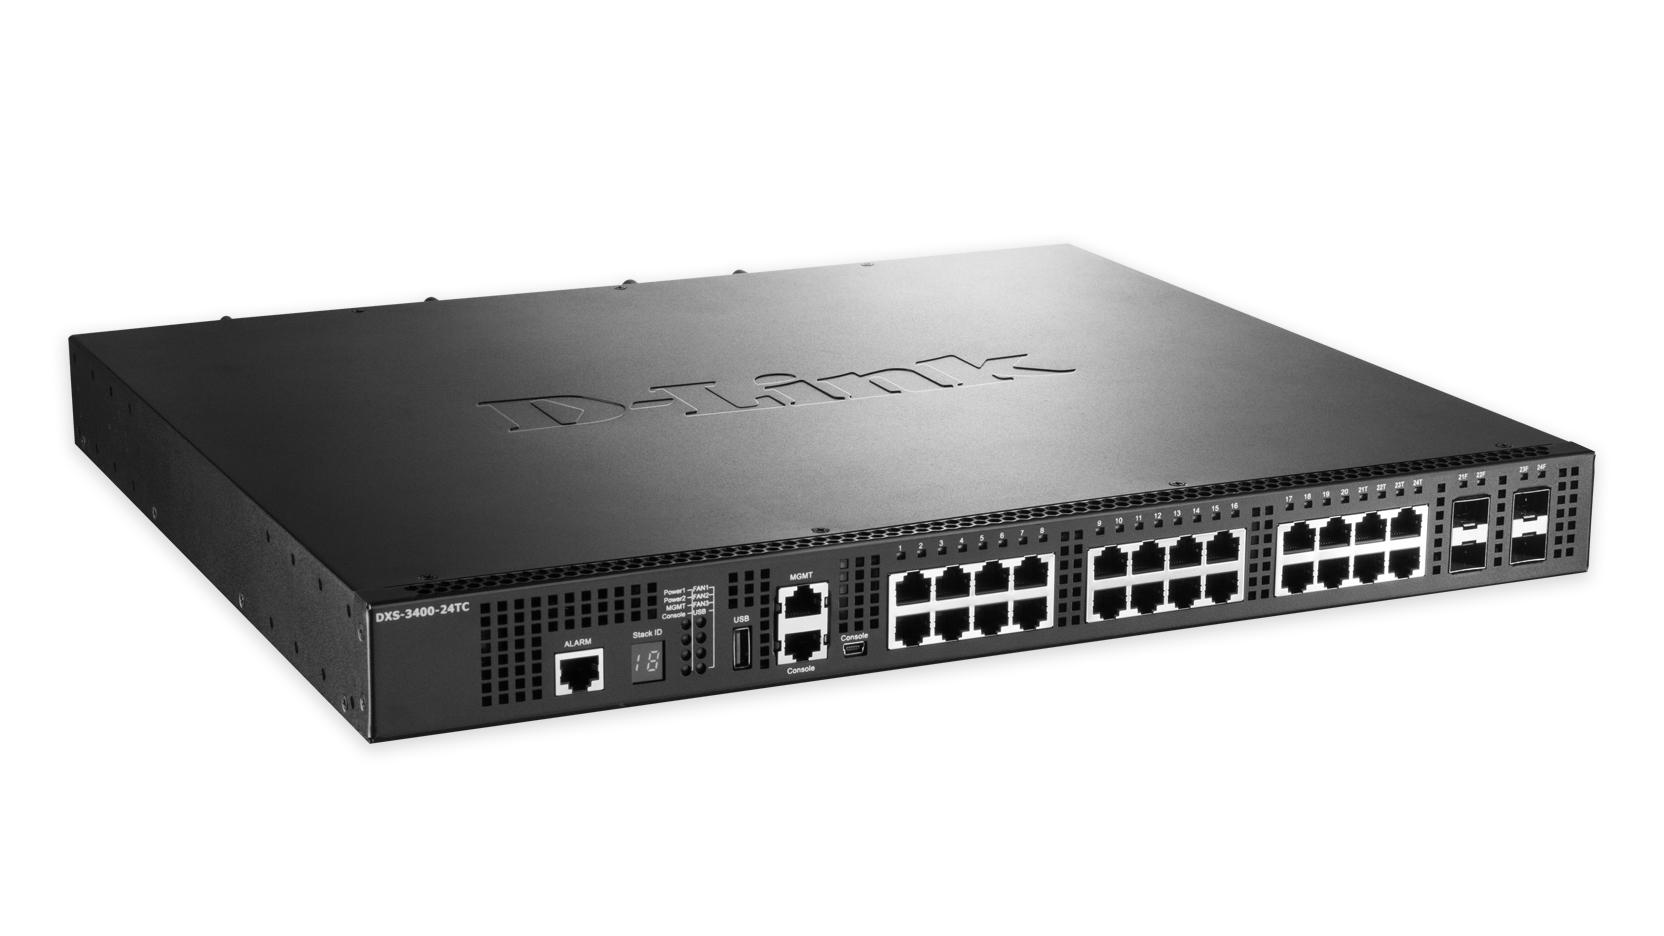 DXS 3400-24SC - Switch - L3 Lite - managed - 20 x 10 Gigabit SFP+ + 4 x combo 10 Gigabit SFP+ - desktop rack-mountable